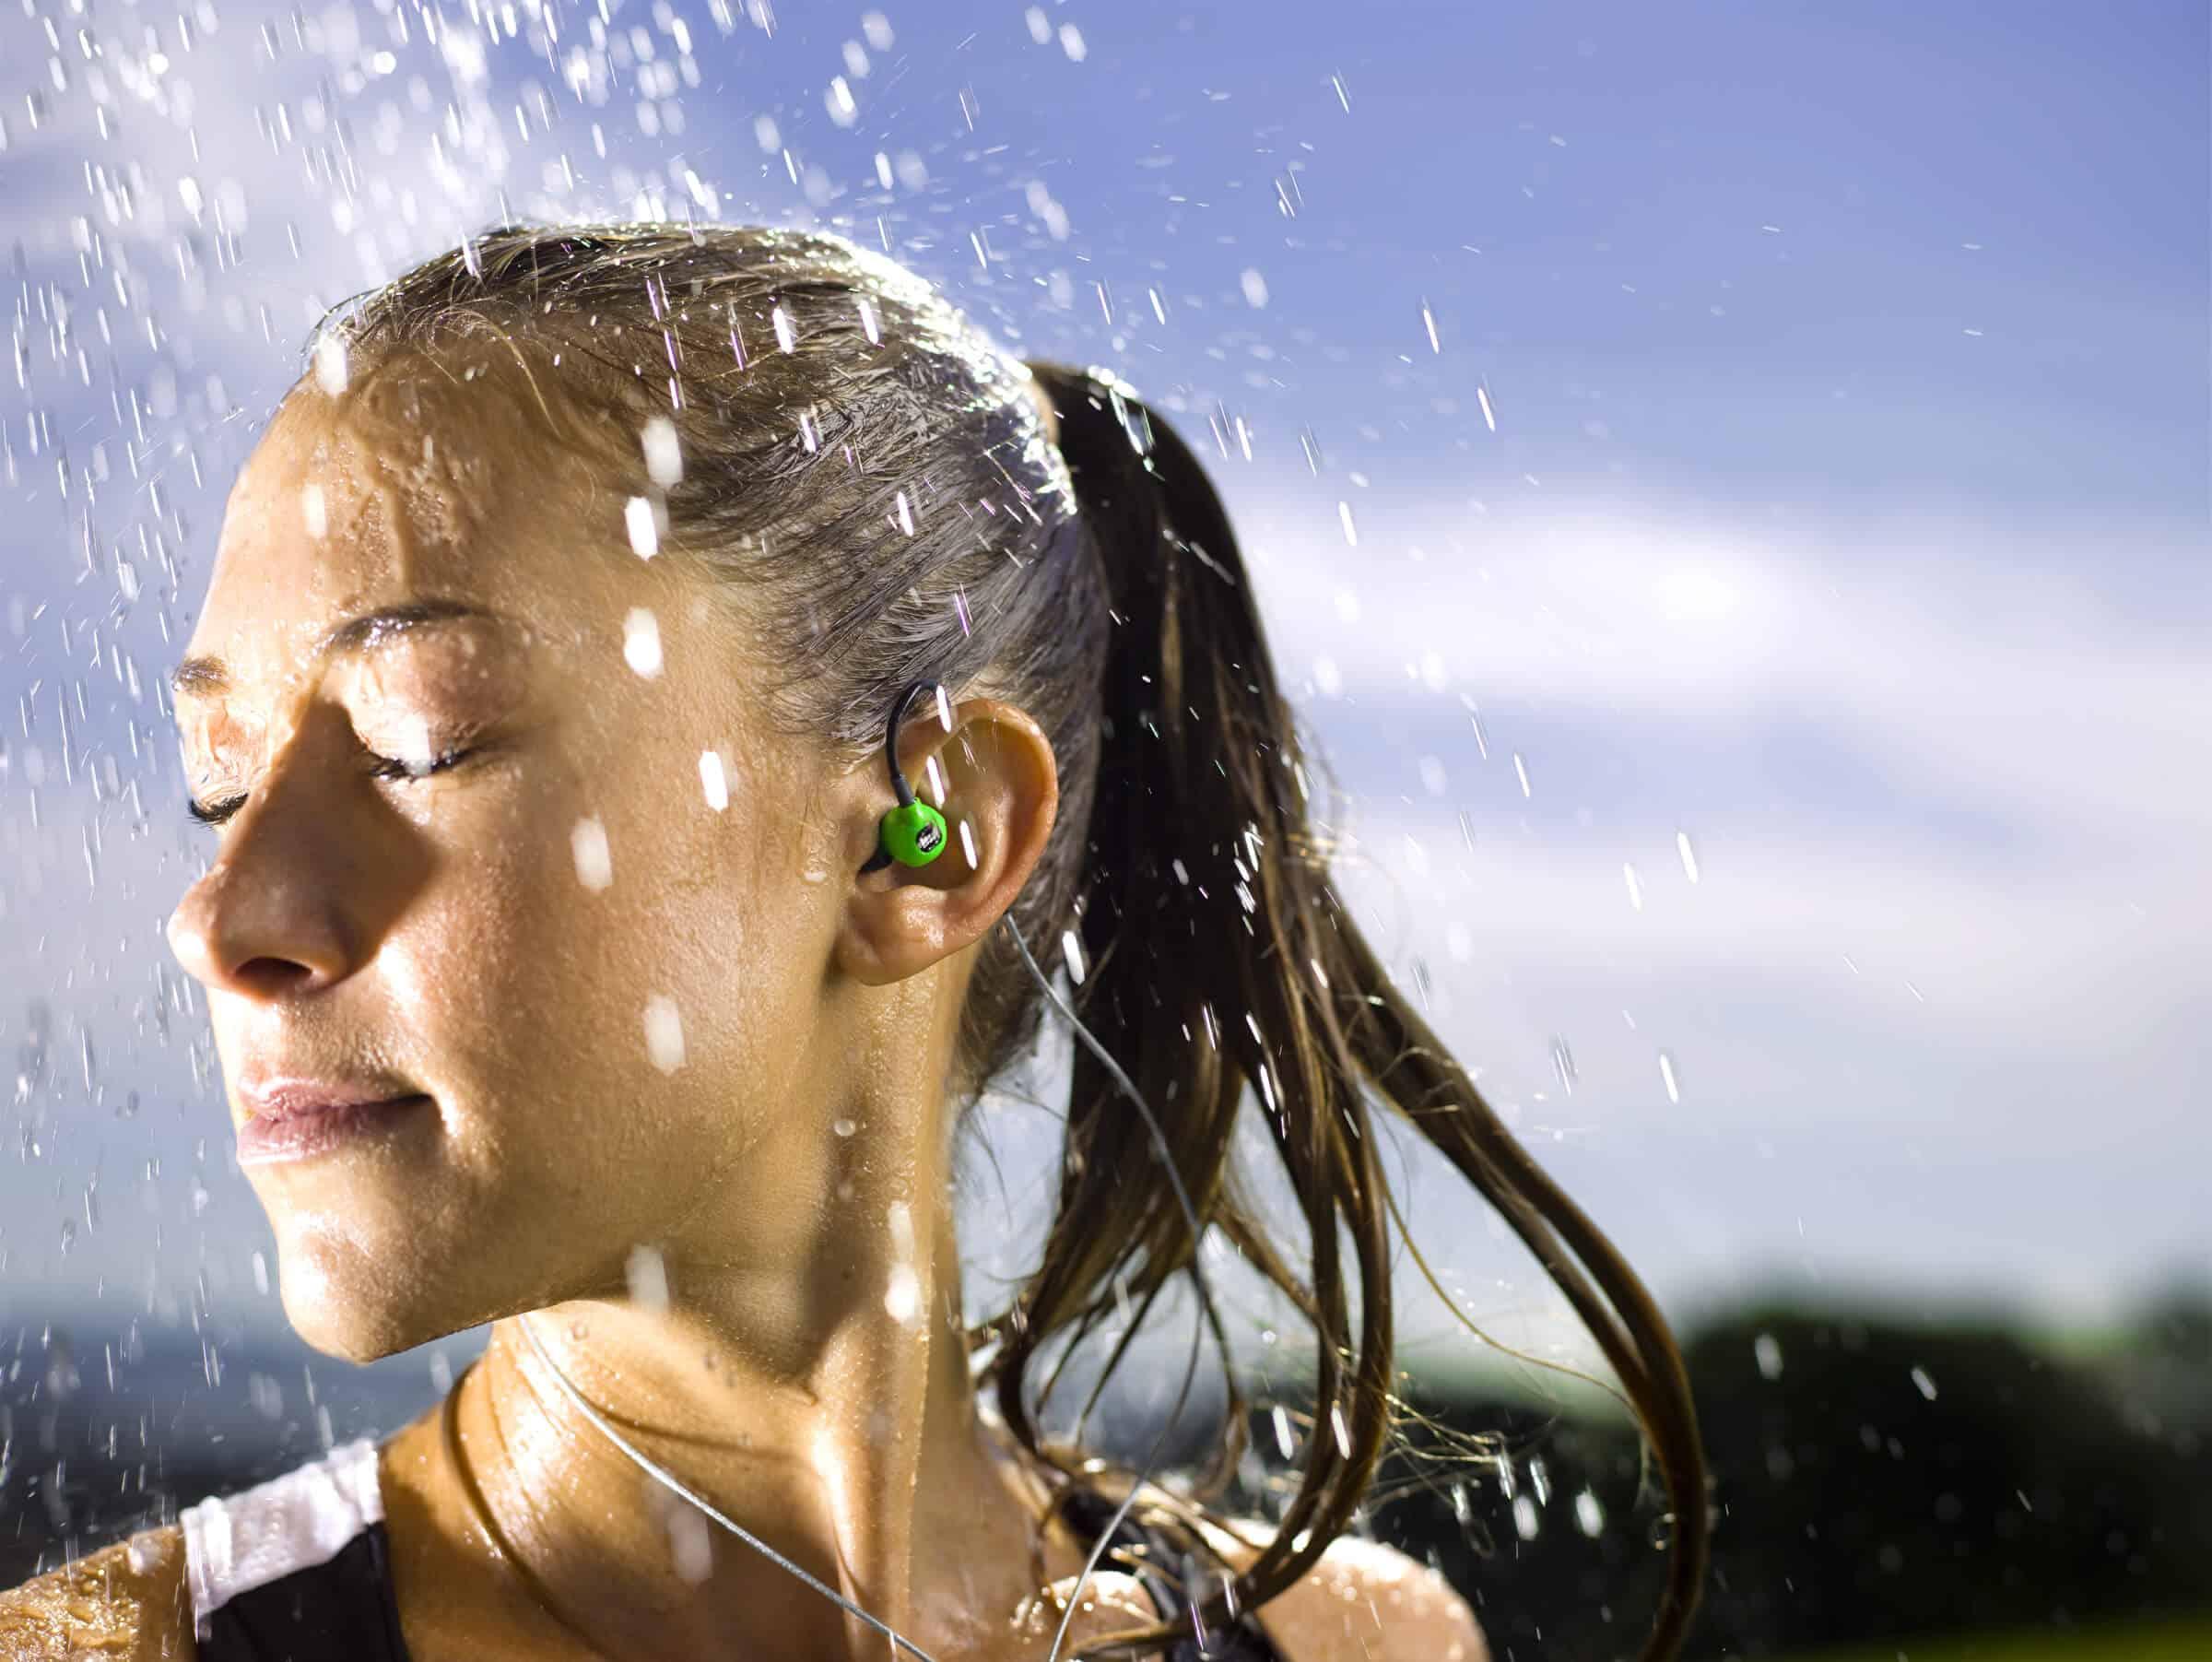 The Top Rated Waterproof Headphones Reactual